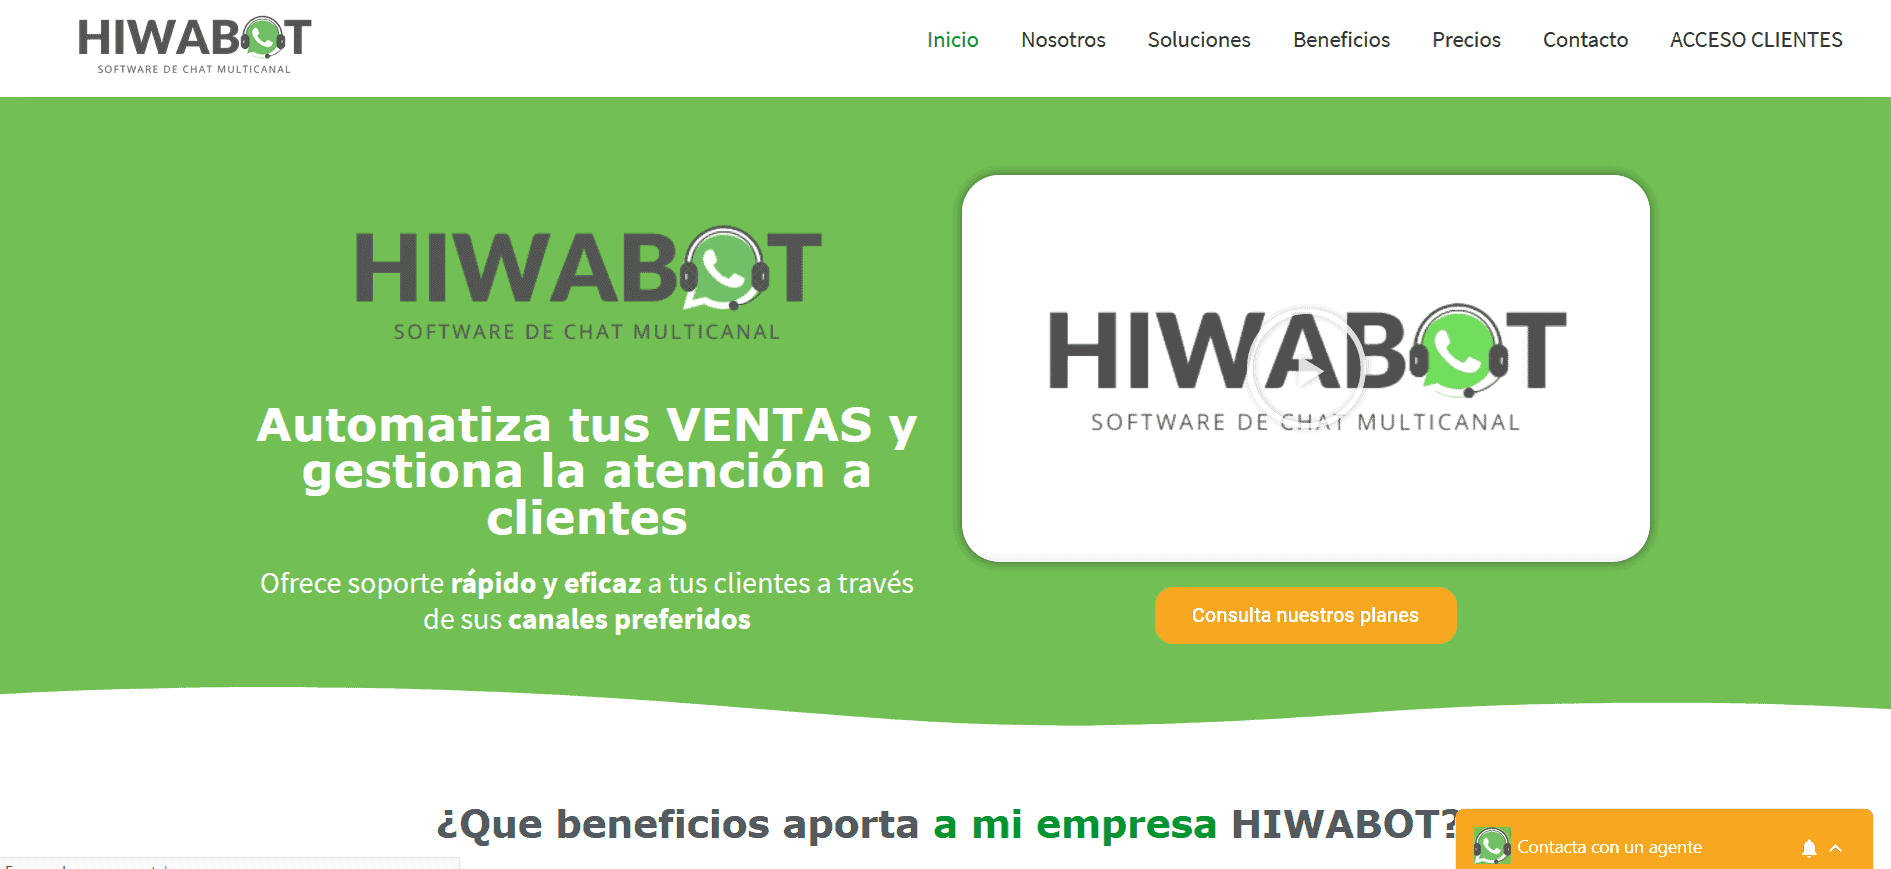 Hiwabot